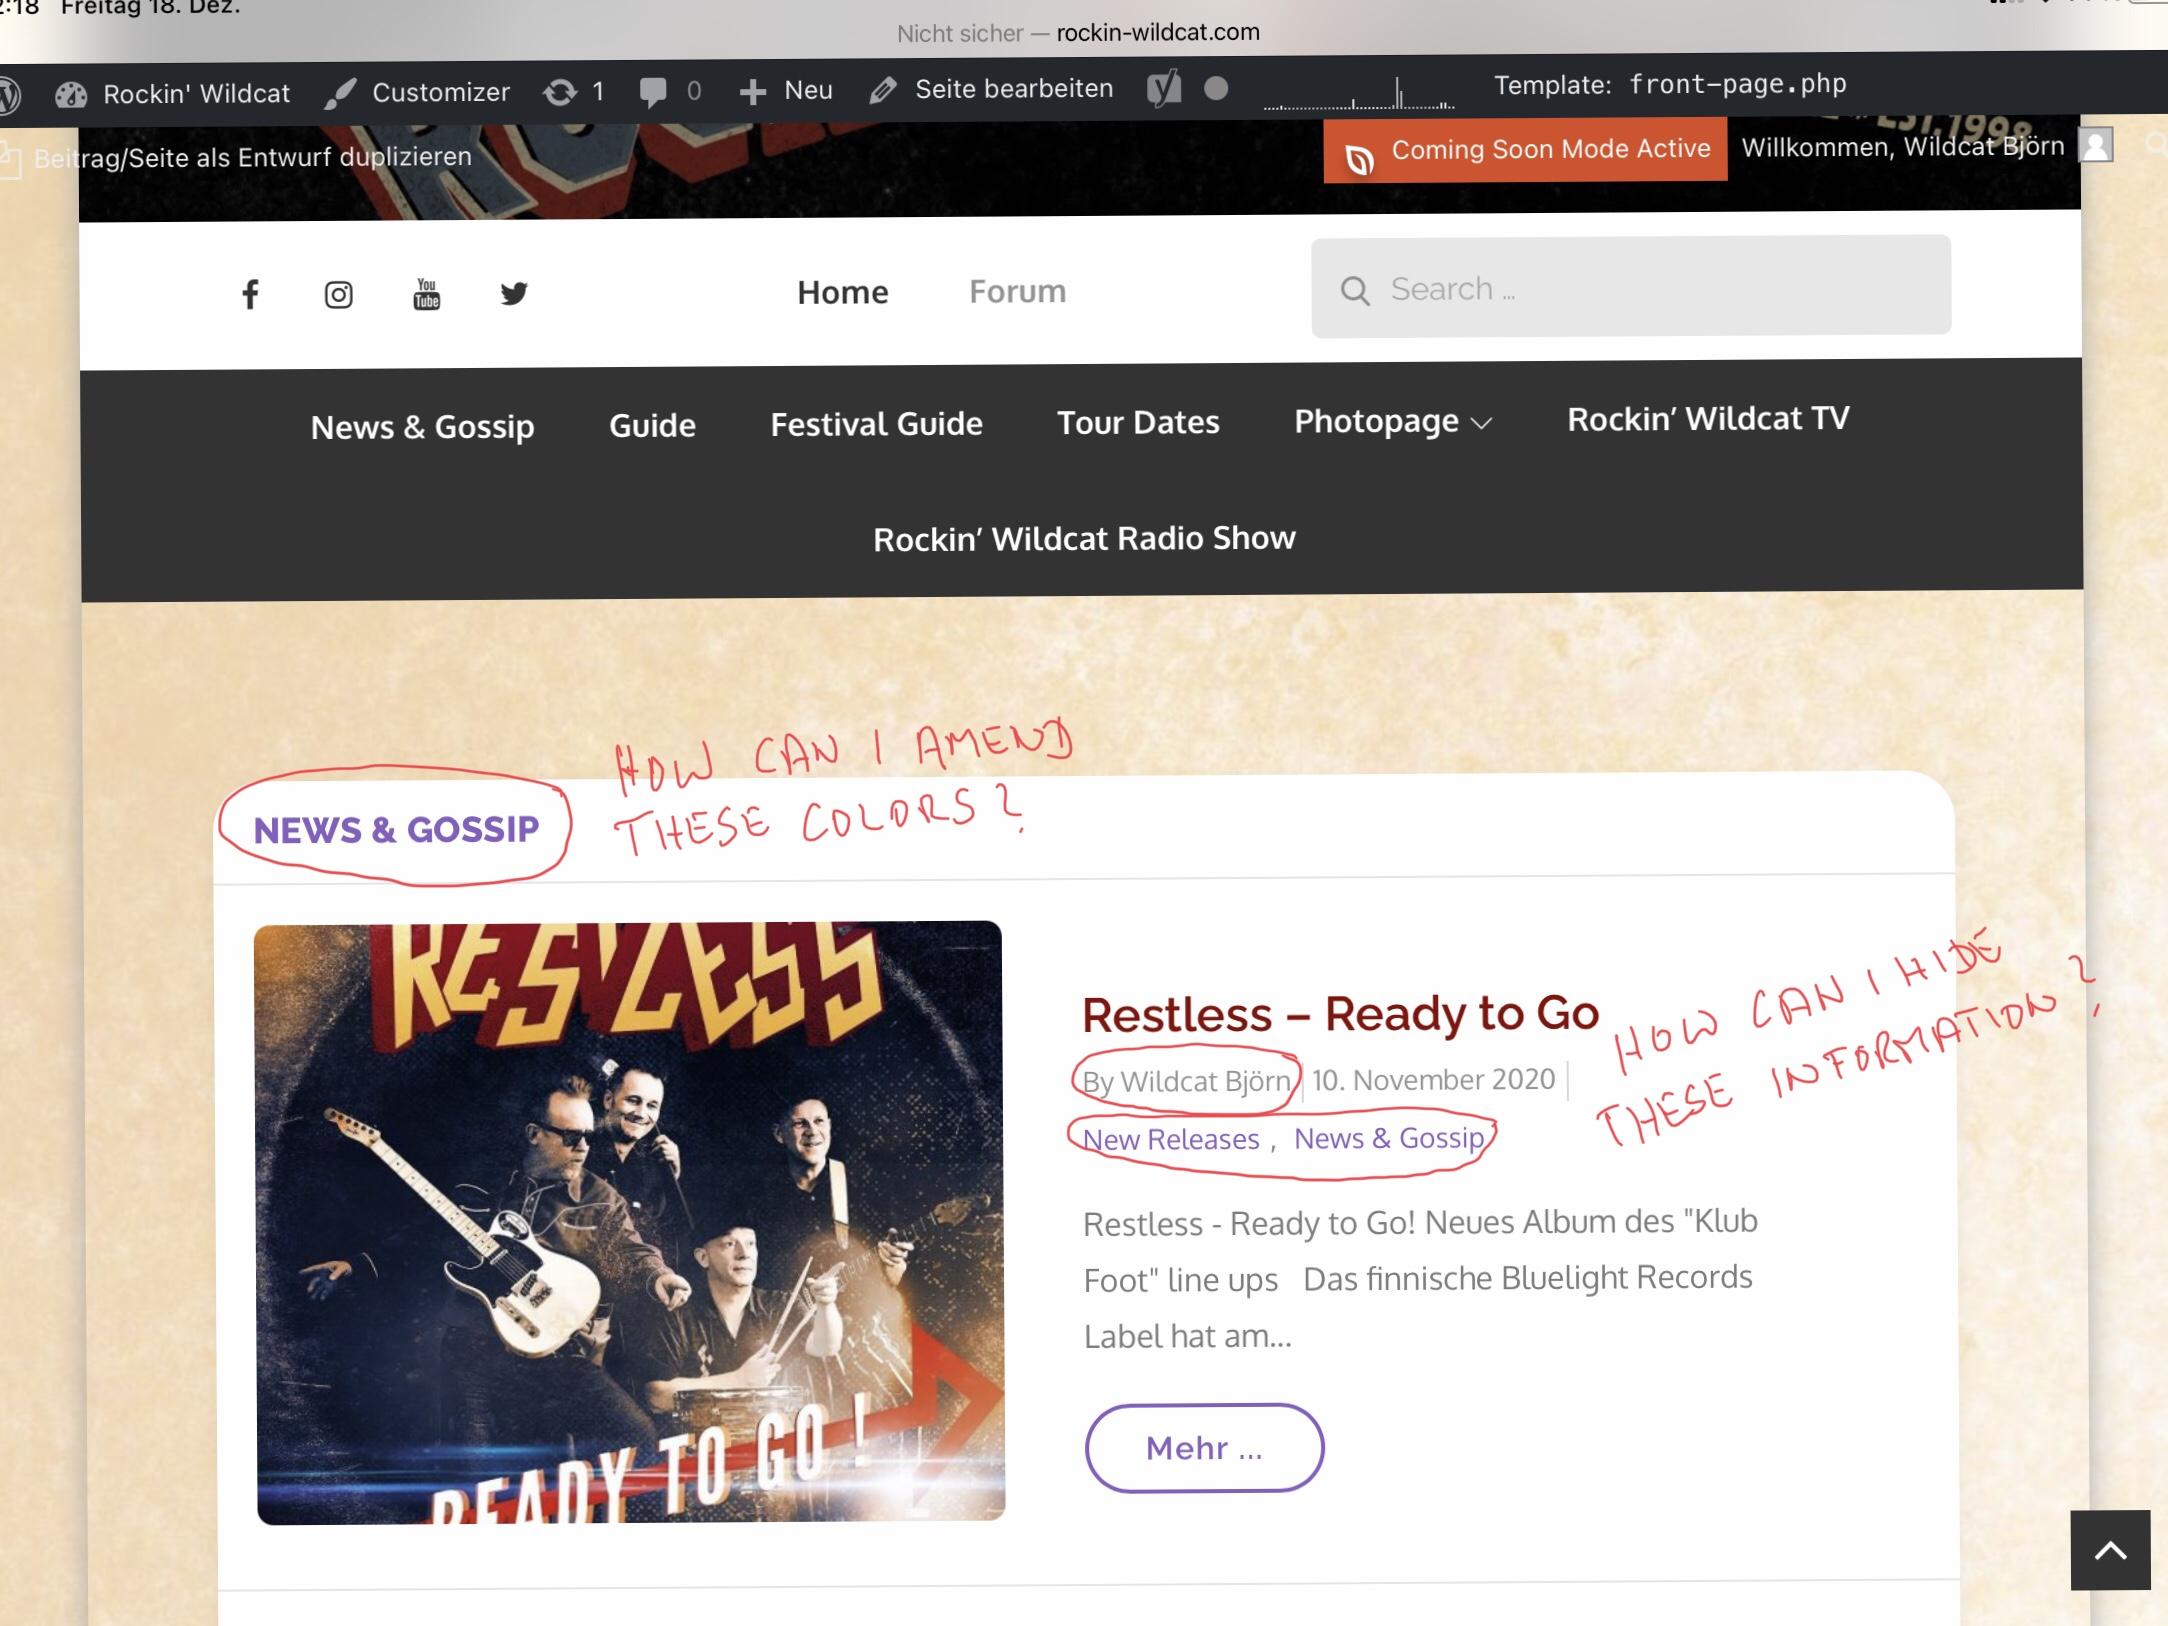 Frontpage, Screenshot 1 - Blog Section